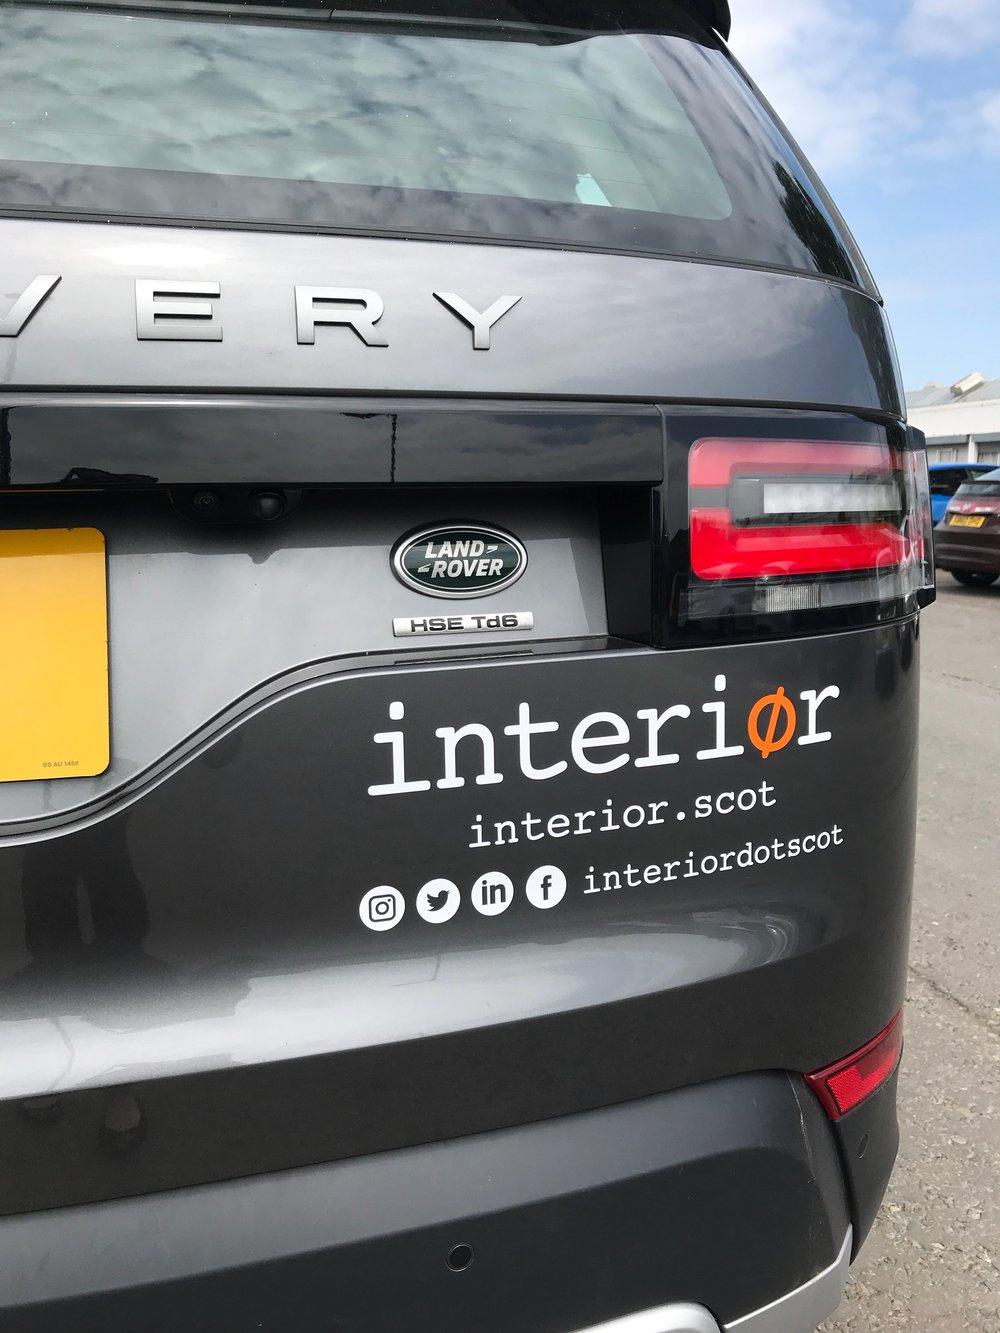 Interior brand added to Karen's car